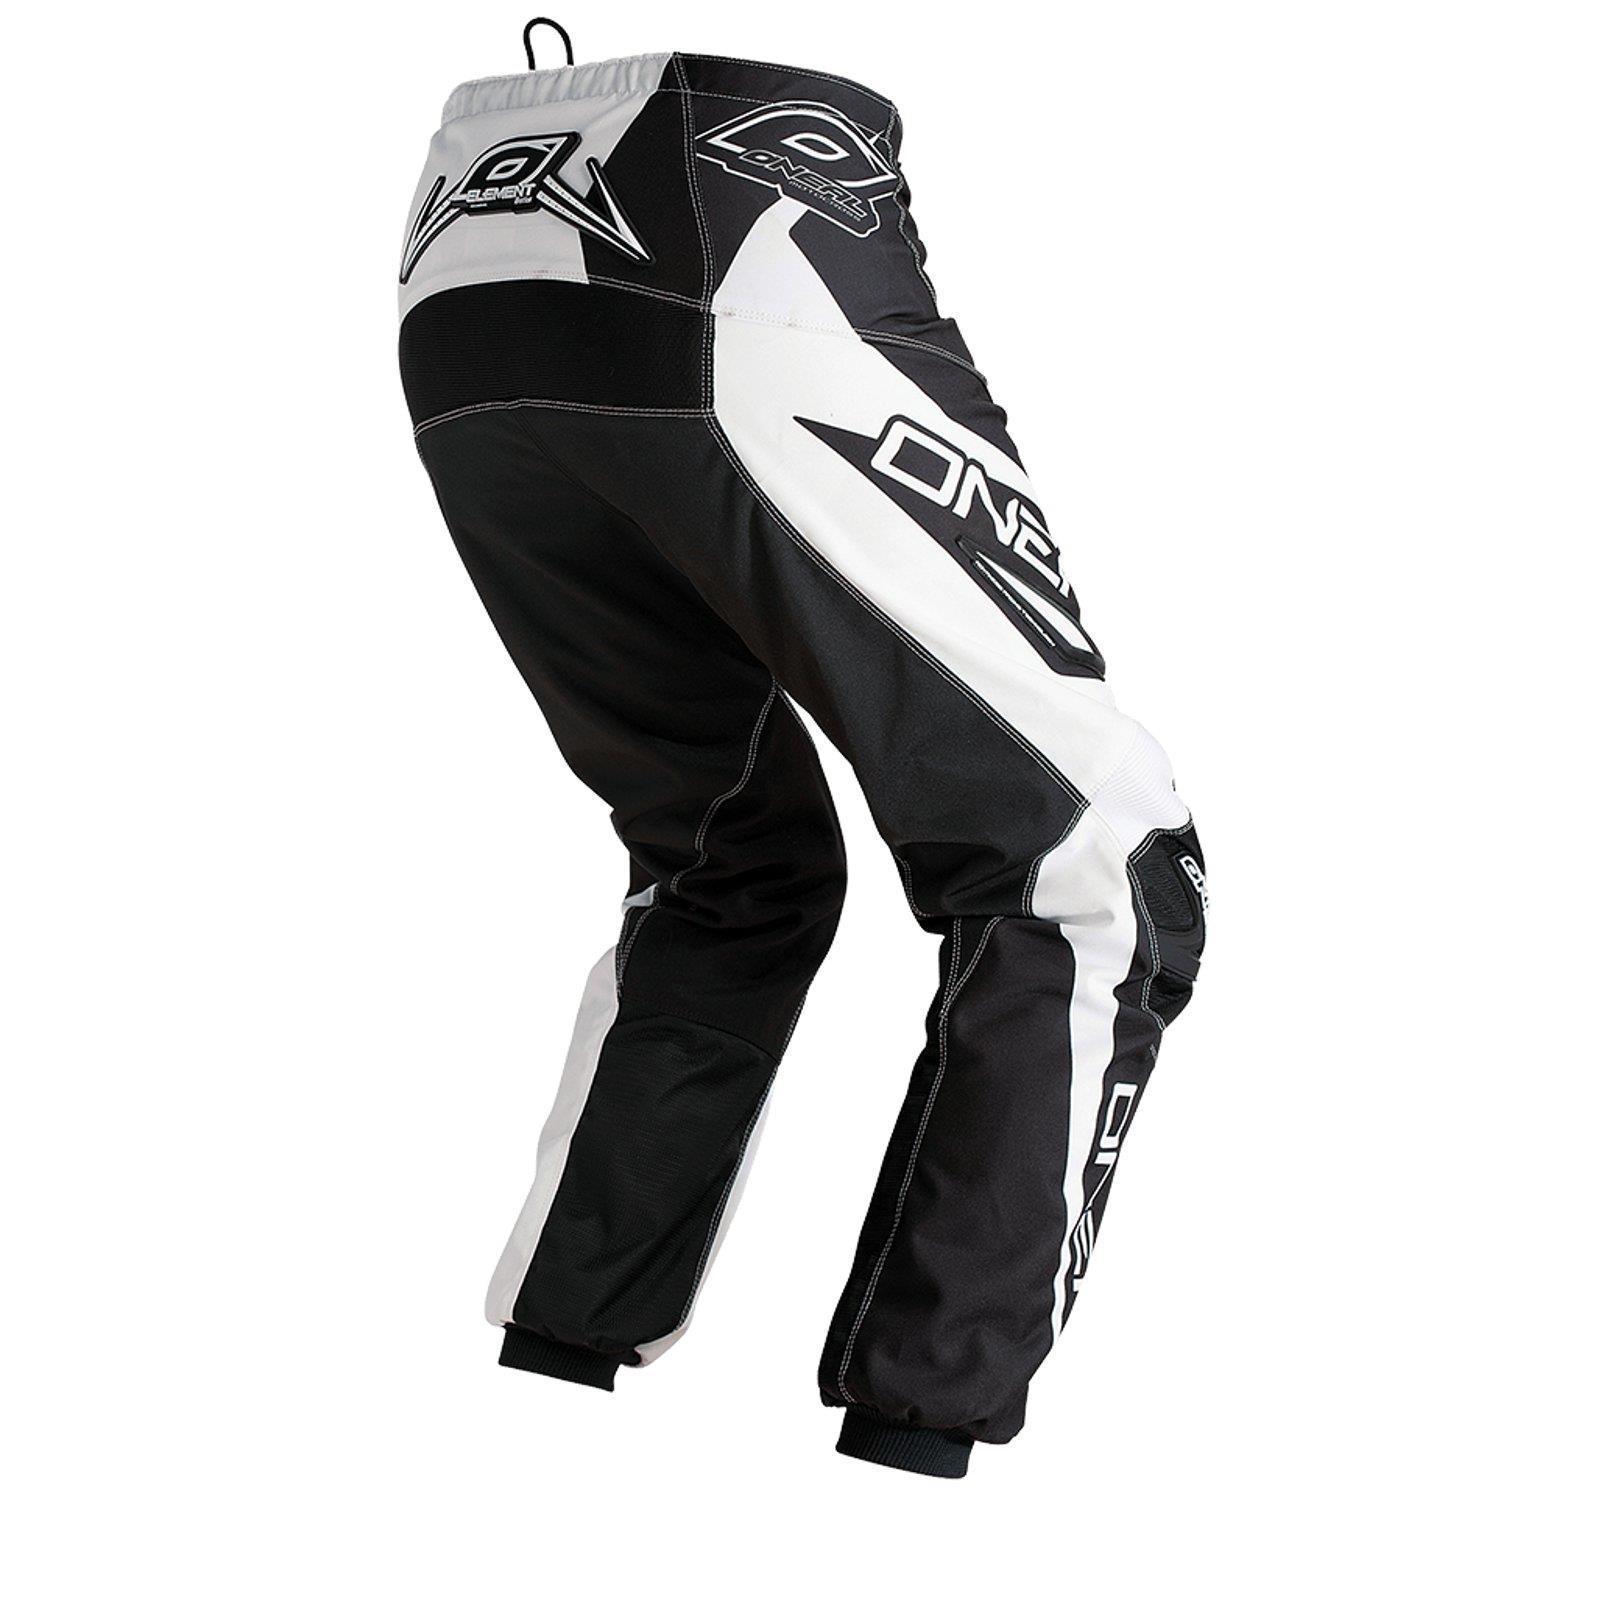 ONeal-pantalones-de-Jersey-de-los-ninos-de-pantalones-cortos-ninos-MX-bicicleta-DH-montana-bicicleta miniatura 18